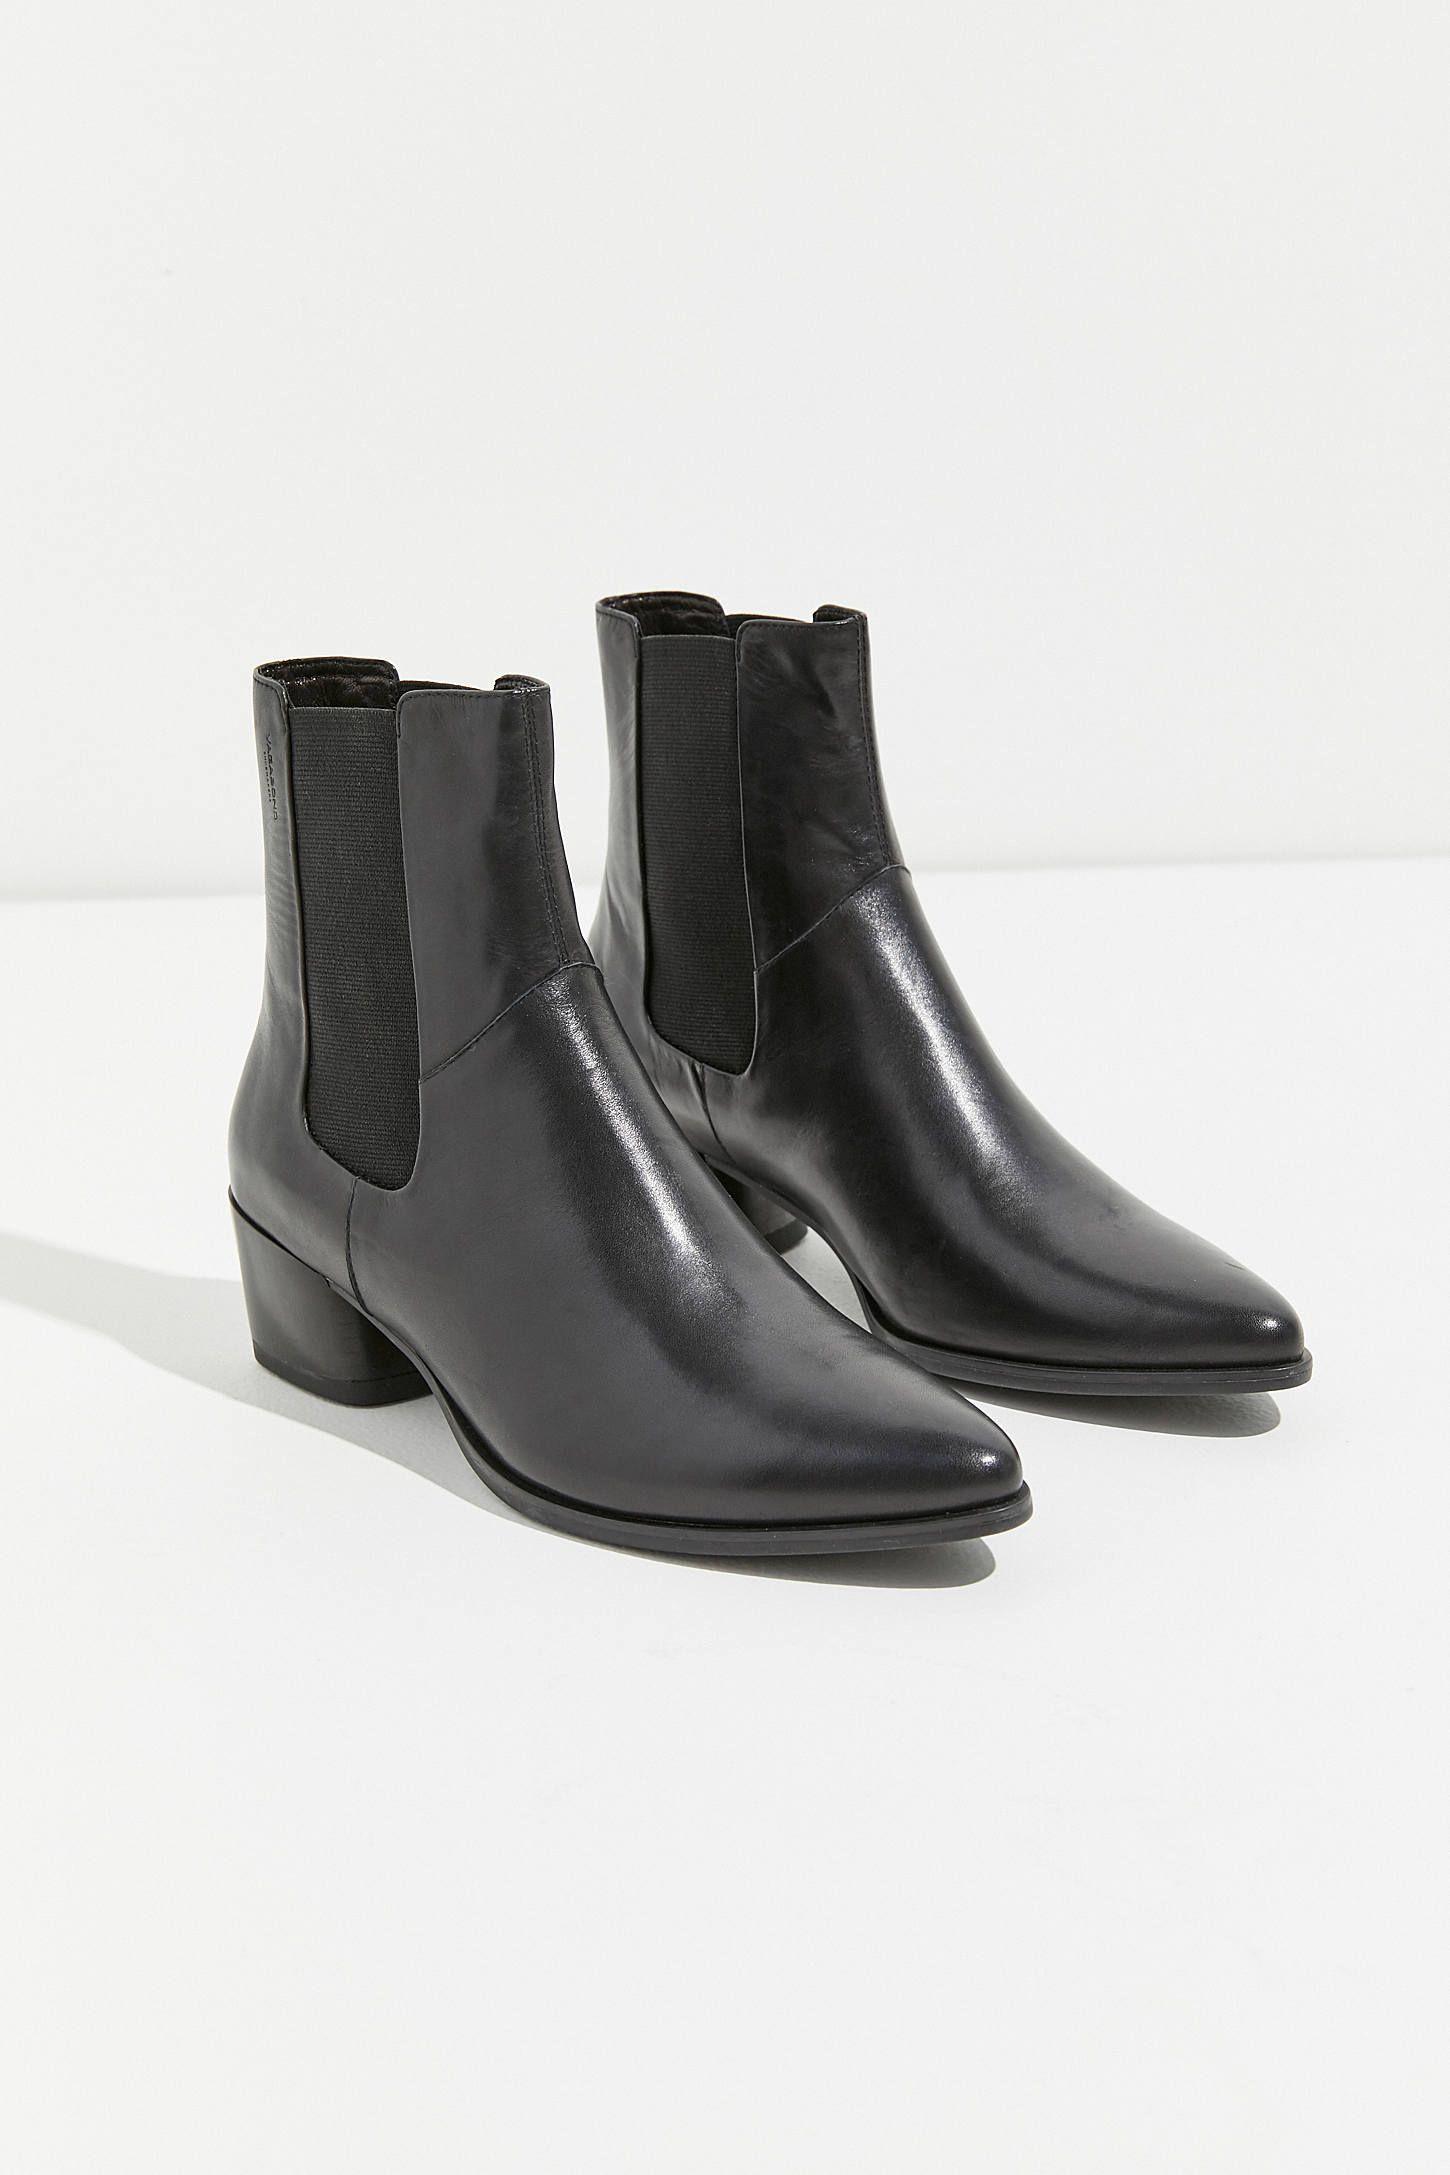 913d65565c1859 Vagabond Shoemakers Lara Chelsea Boot in 2019